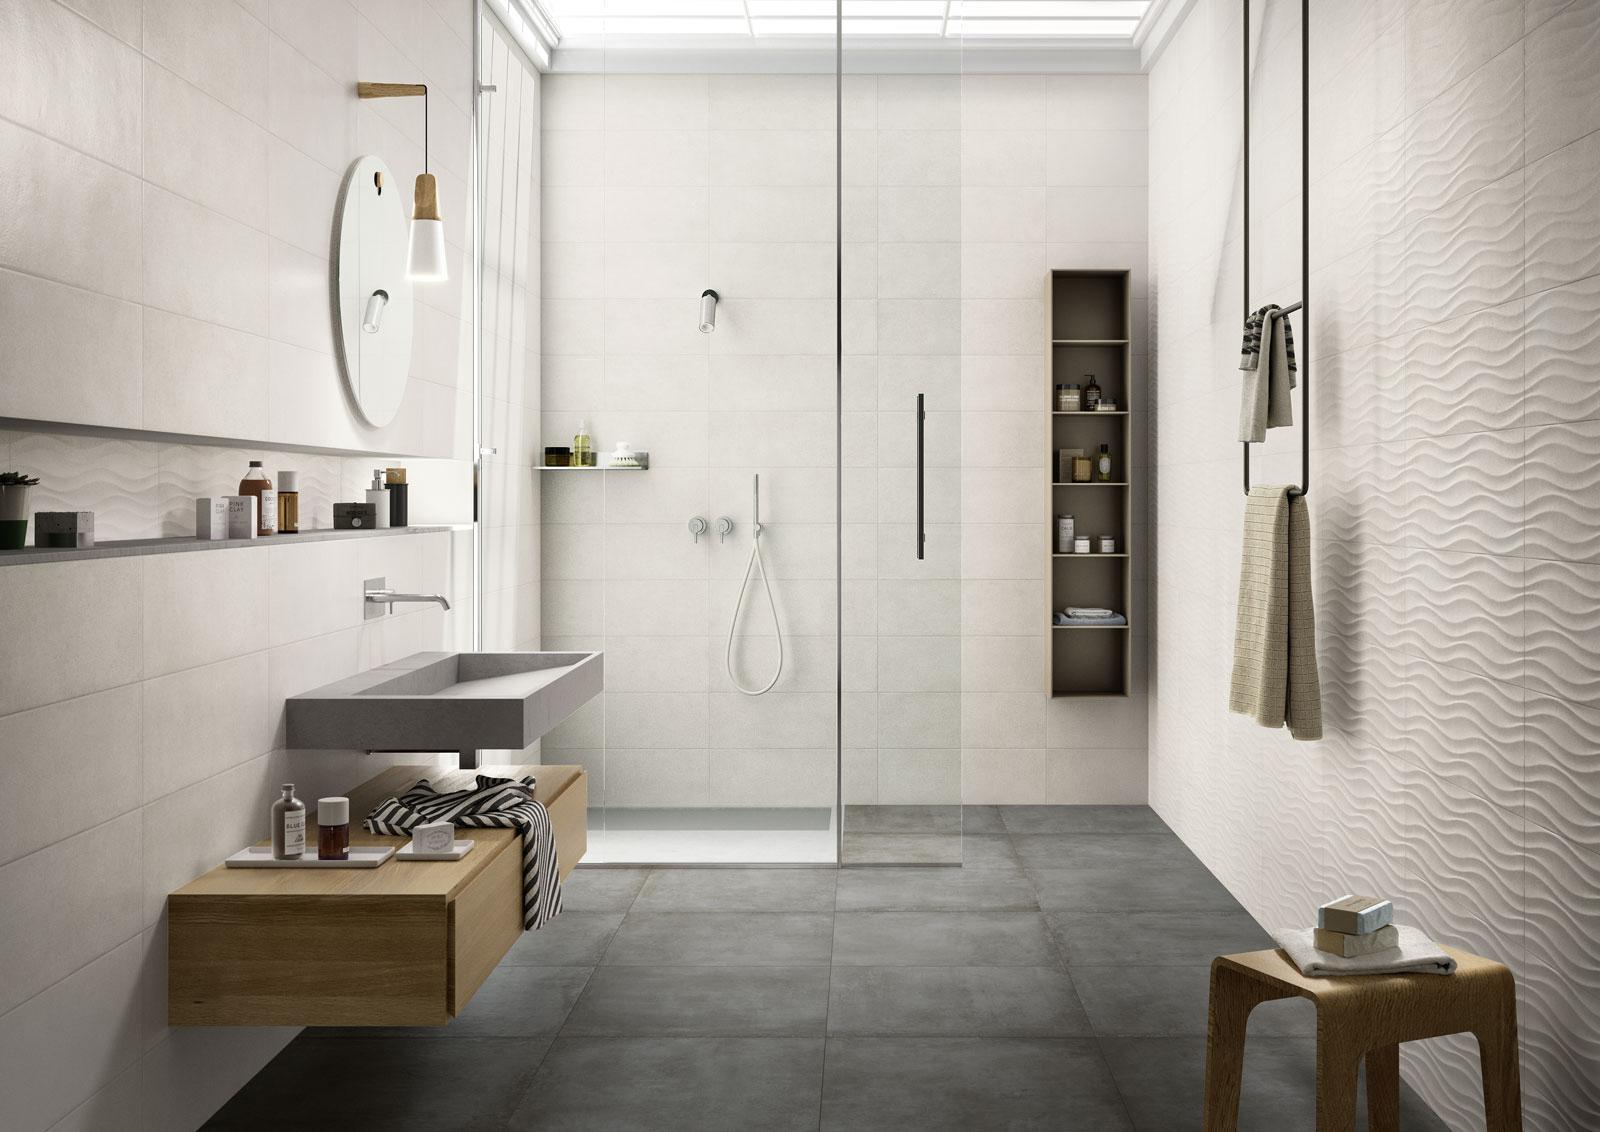 Clayline - Terracotta look ceramic wall covering   Marazzi